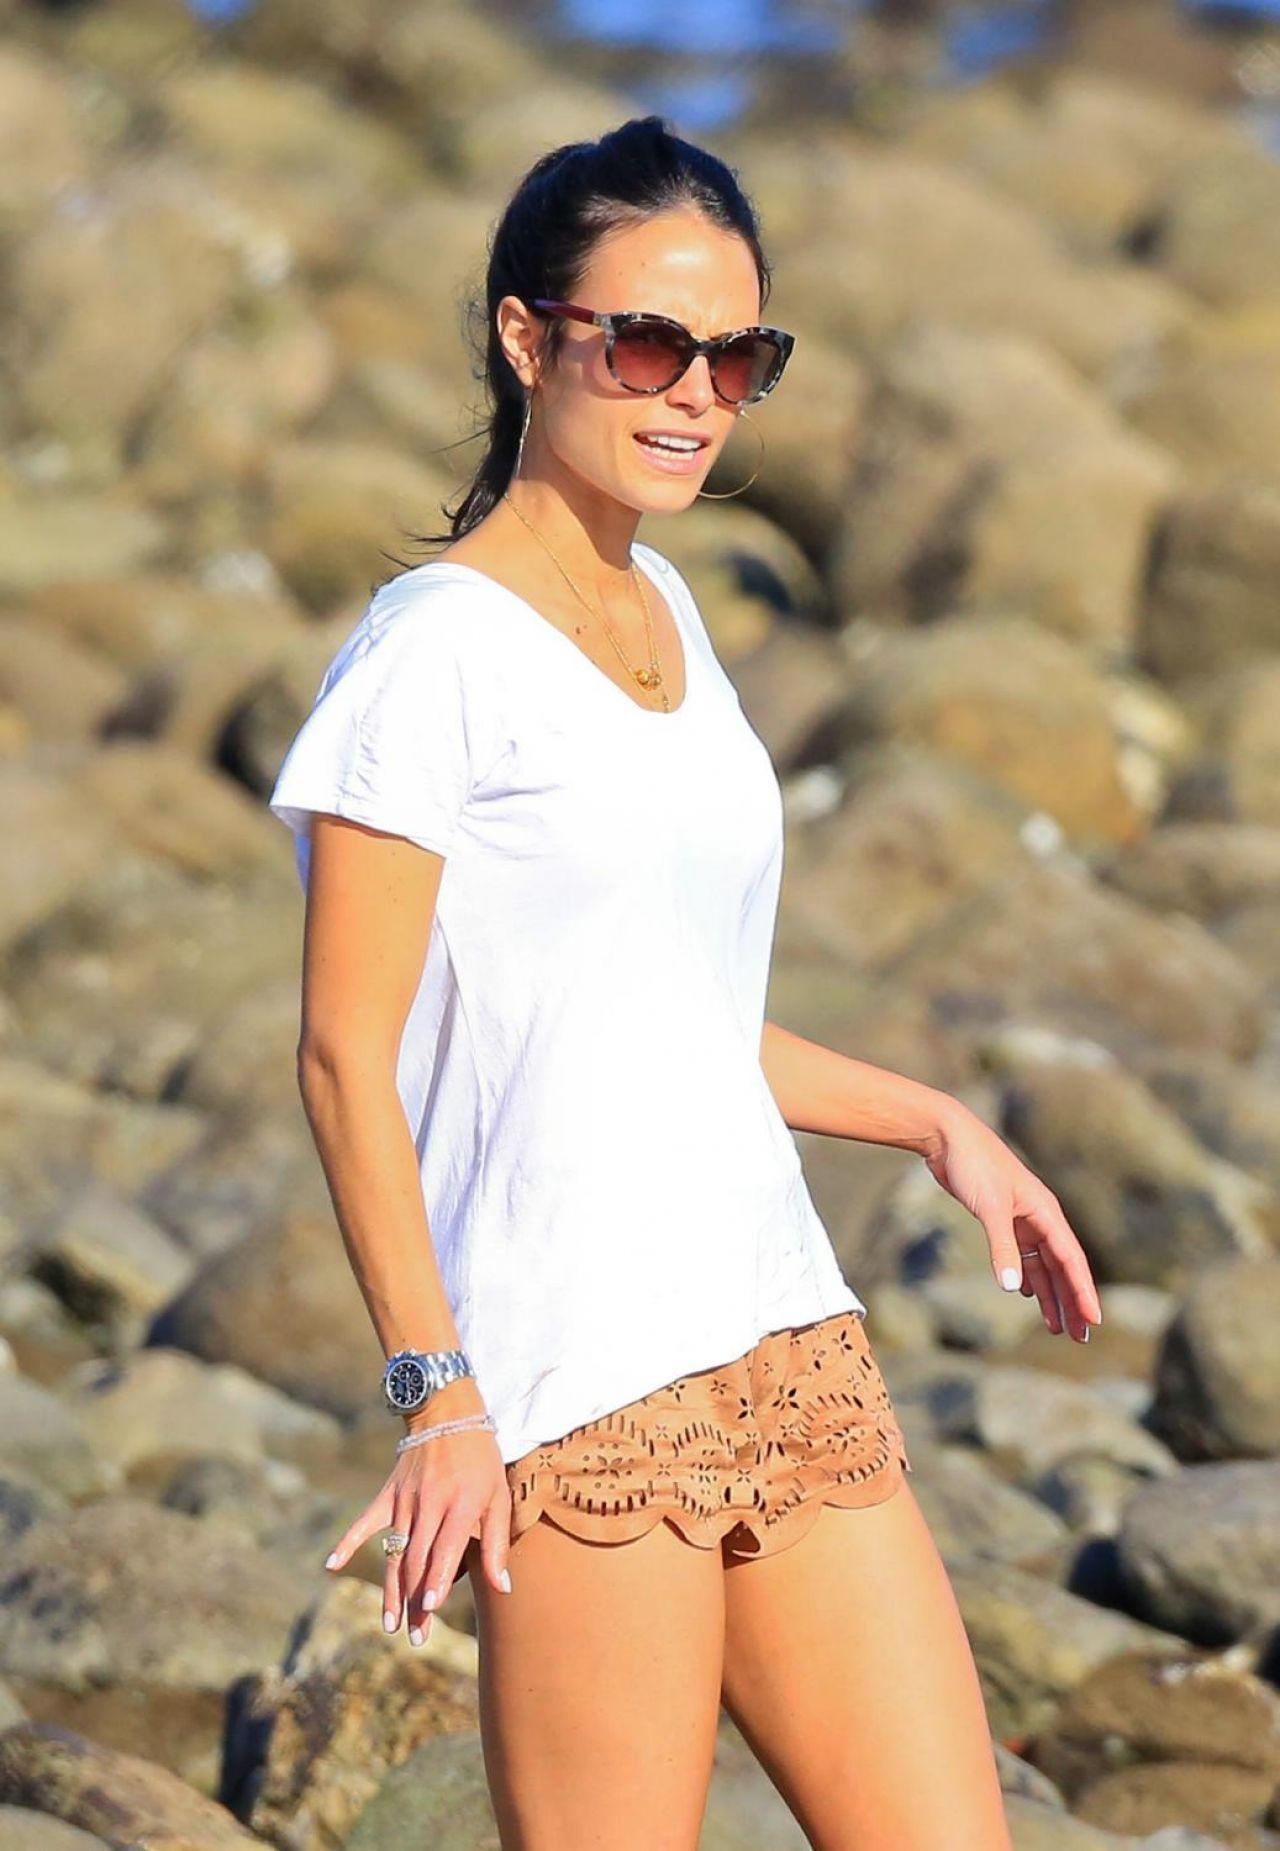 Jordana Brewster On The Beach In Malibu